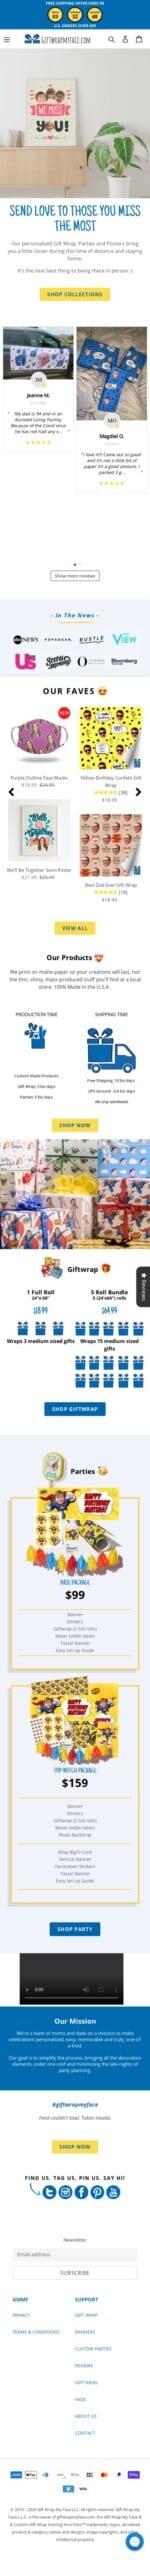 GiftWrapMyFace Coupon